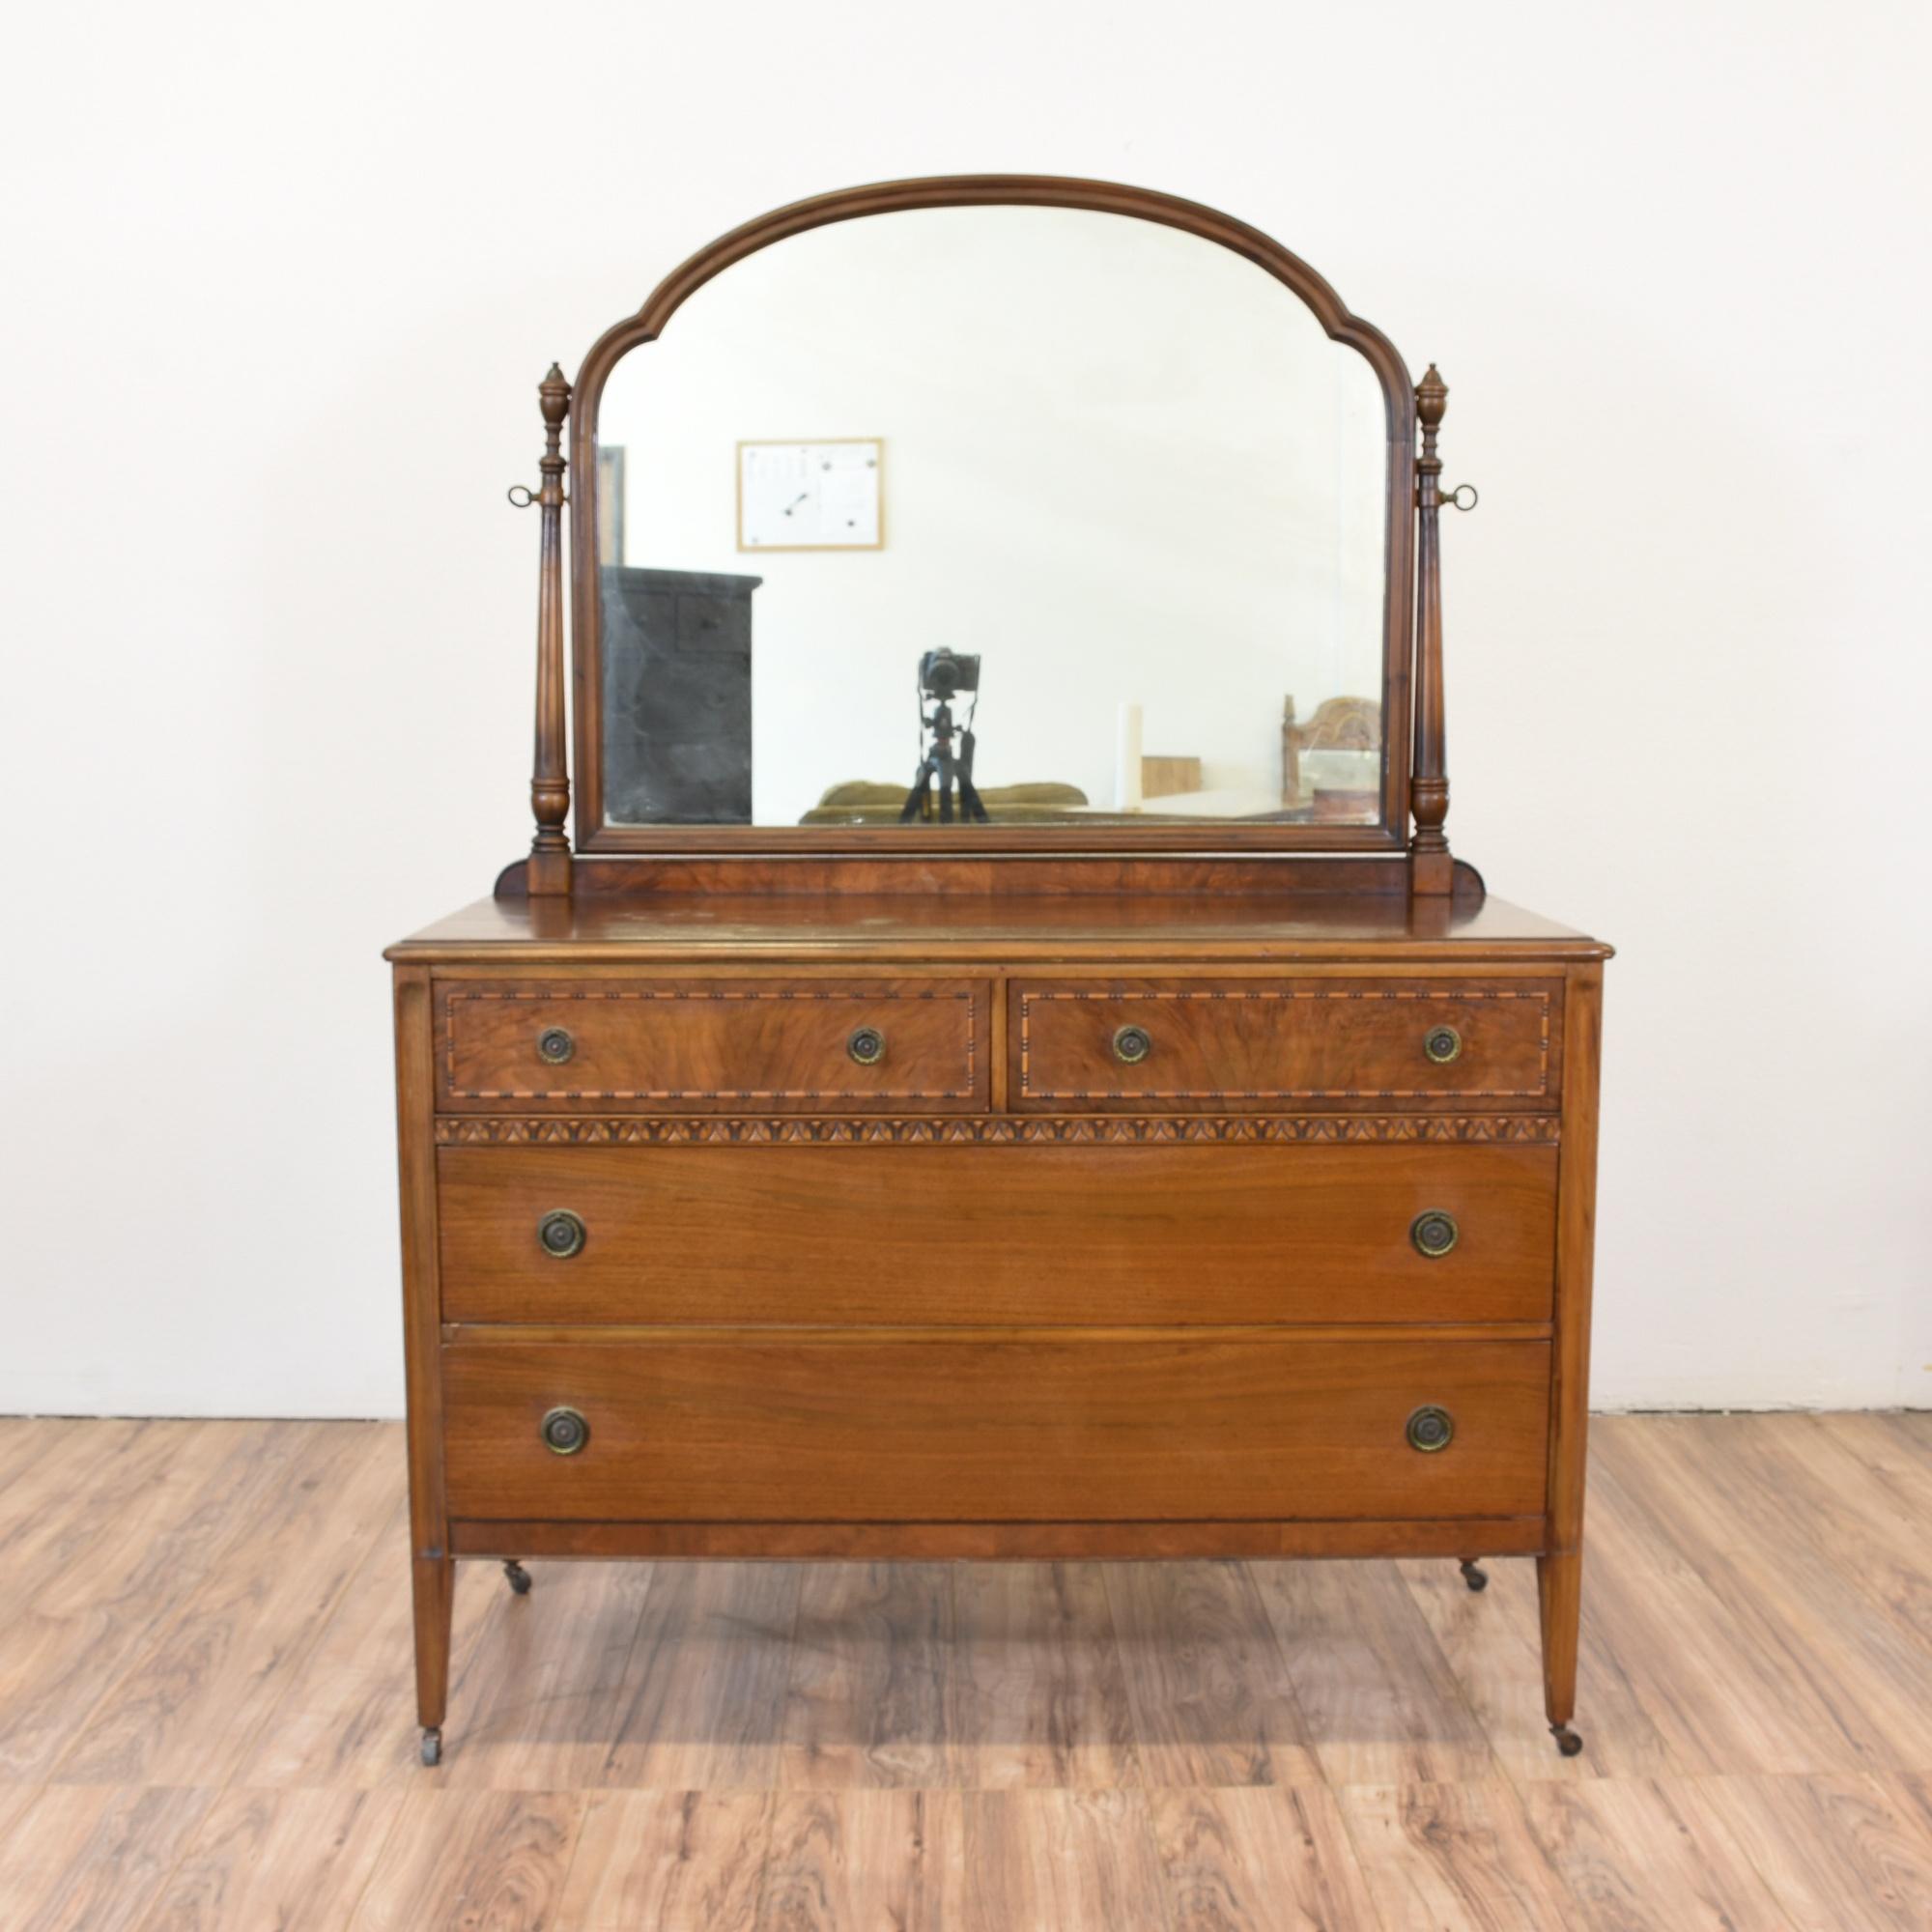 antique berkey gay dresser mirror loveseat vintage furniture san diego los angeles. Black Bedroom Furniture Sets. Home Design Ideas